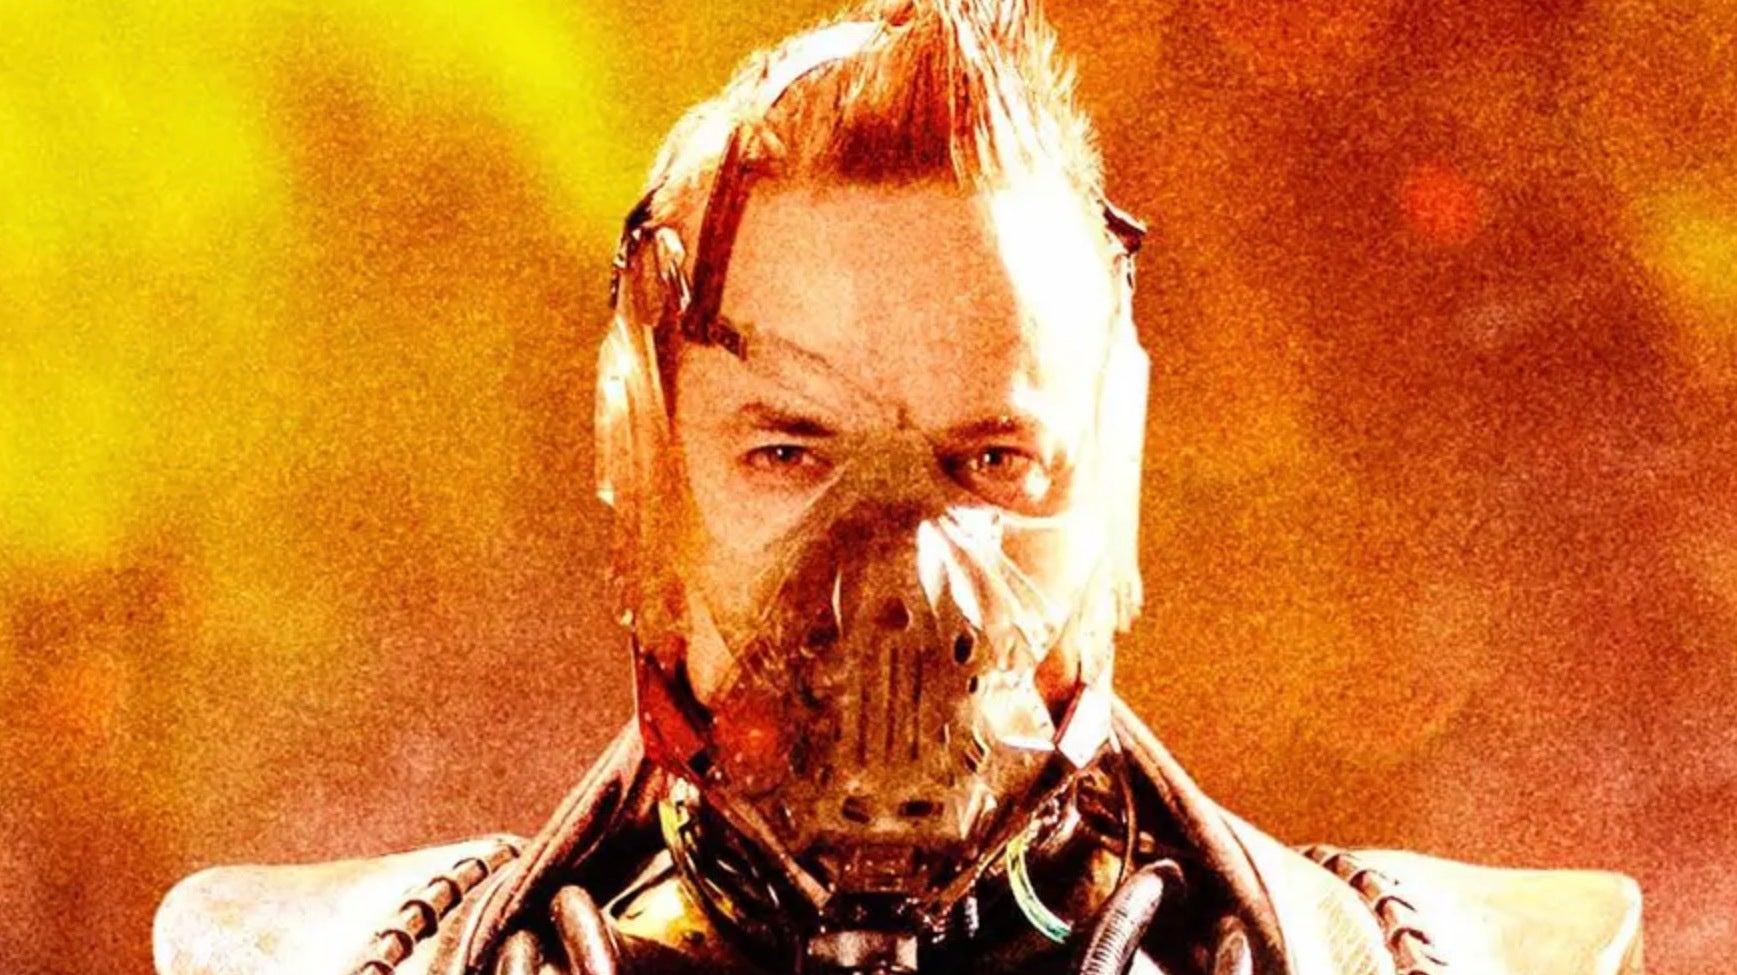 Gotham's Version Of Bane Looks Like A Mortal Kombat Character Puked Up A Terminator